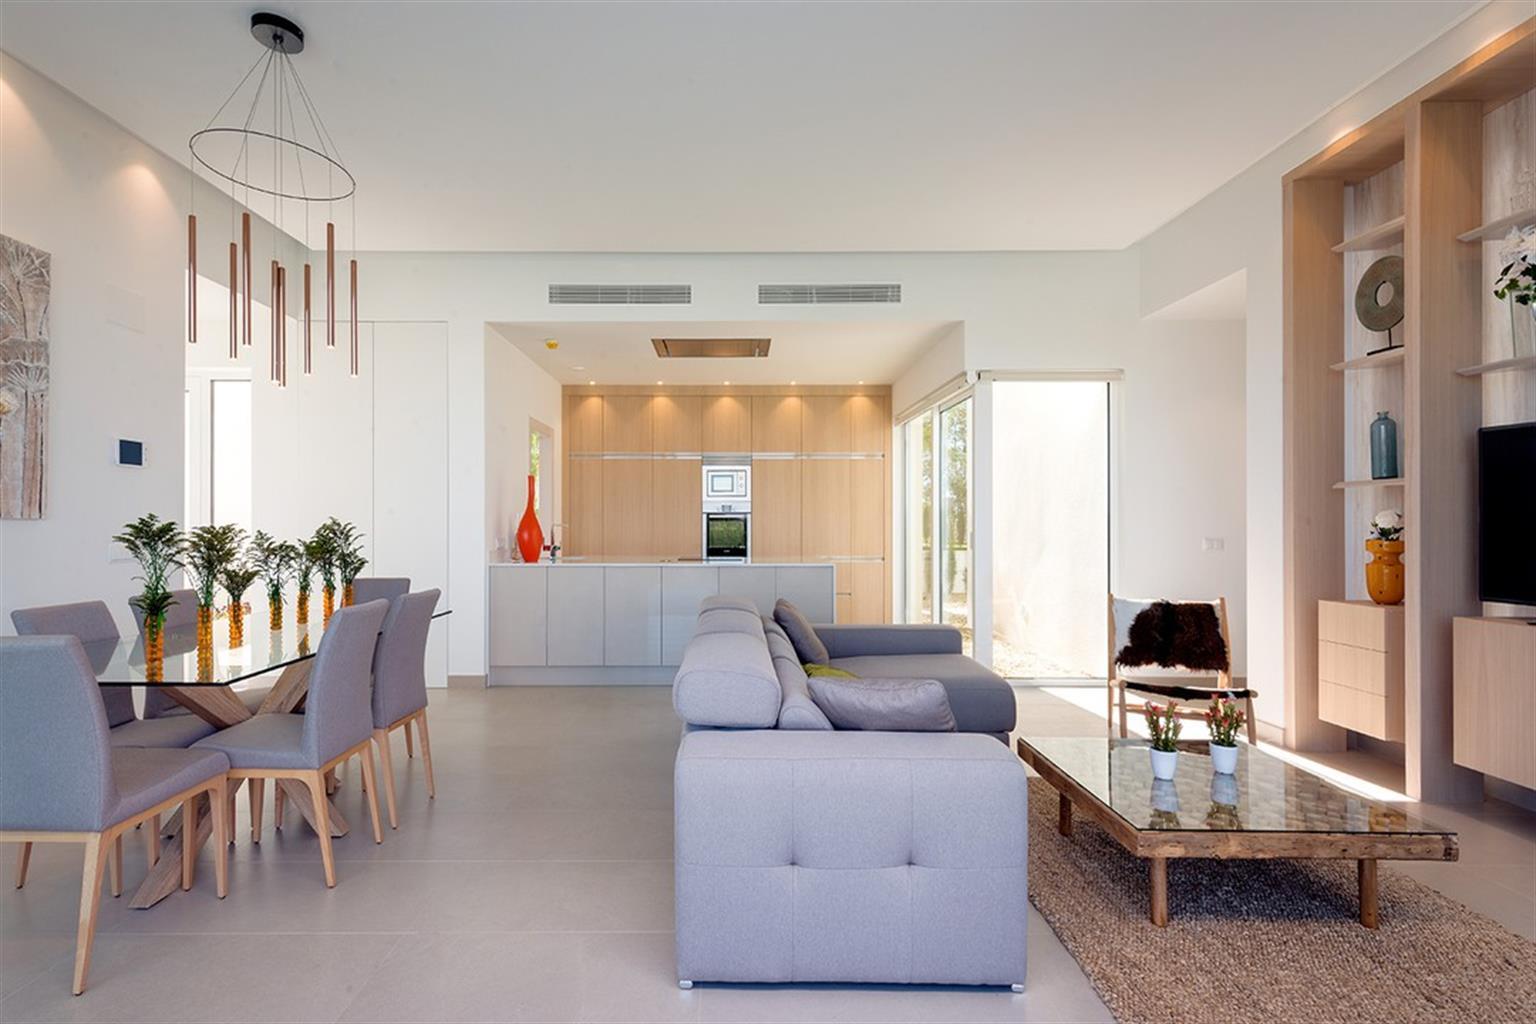 Maison - Villamartin - #4228155-13